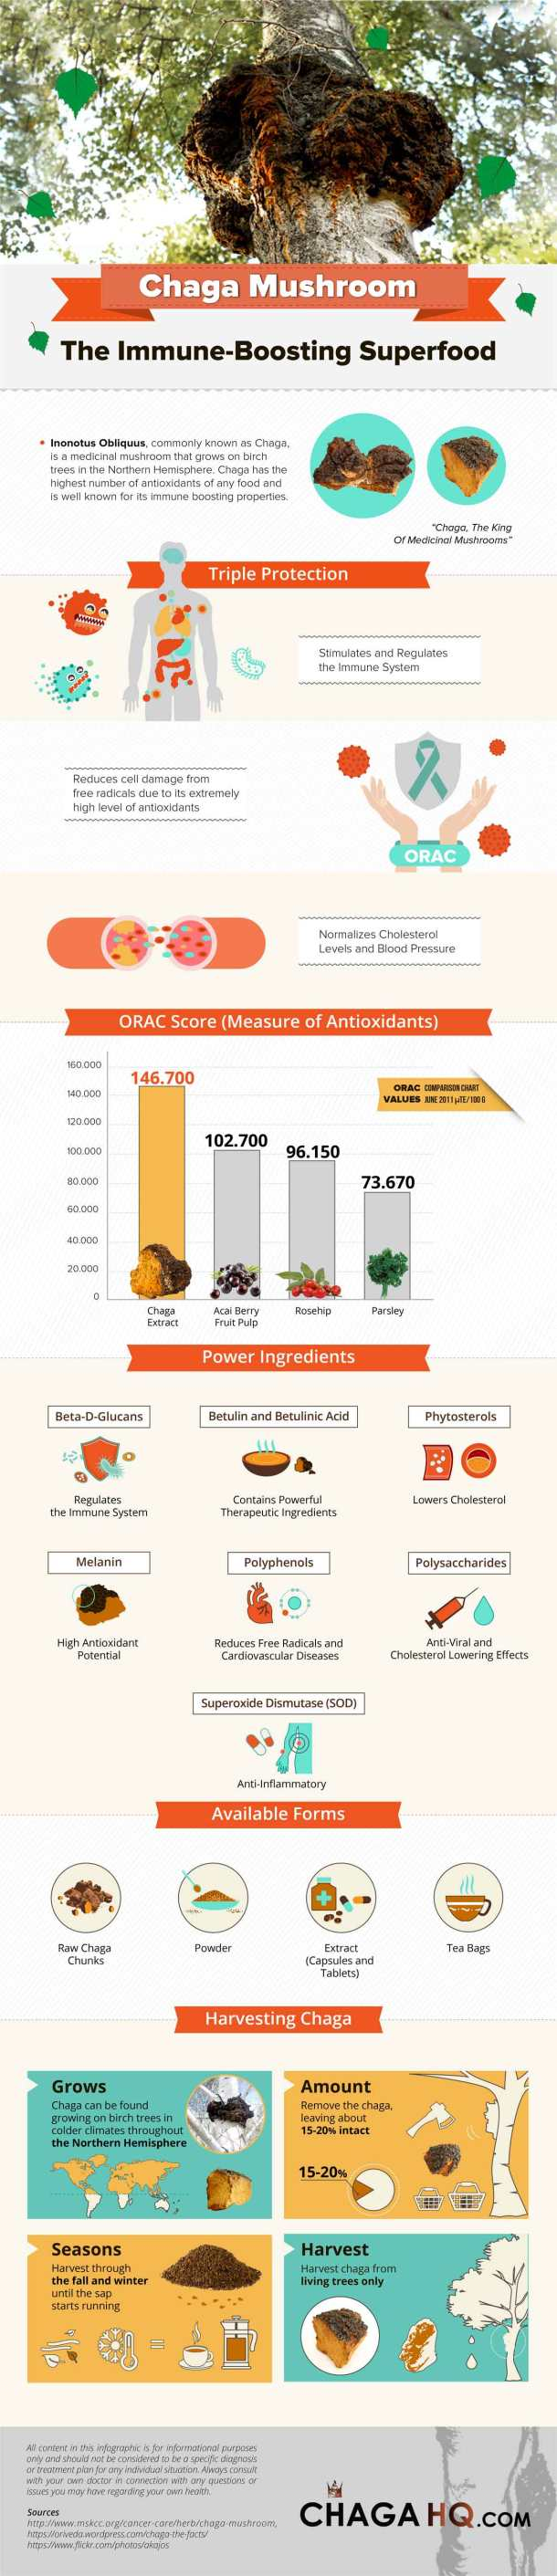 chaga_mushroom_infographic